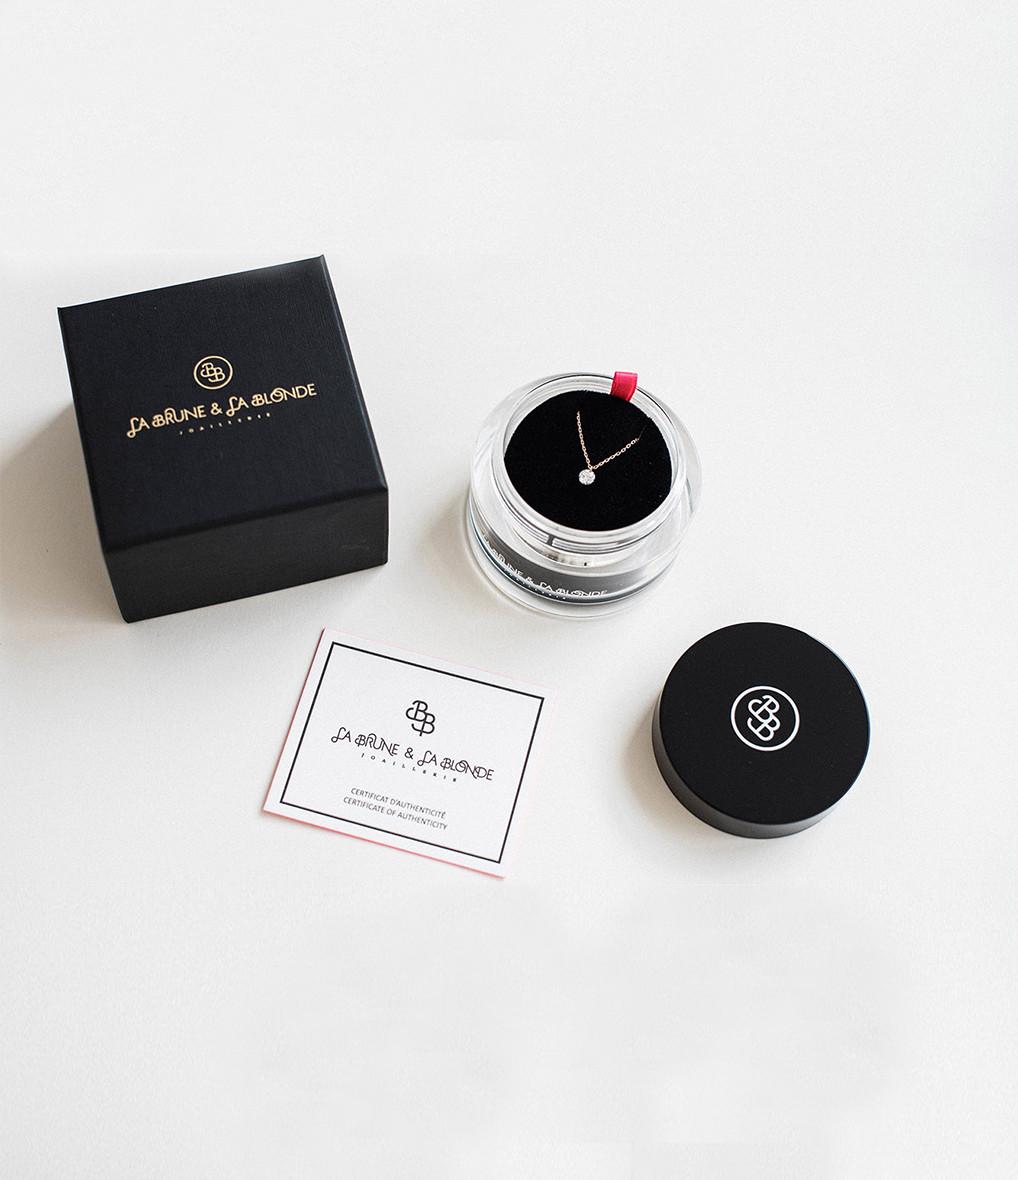 LA BRUNE & LA BLONDE - Bracelet 360° Diamant Brillant 0,07 Or Blanc